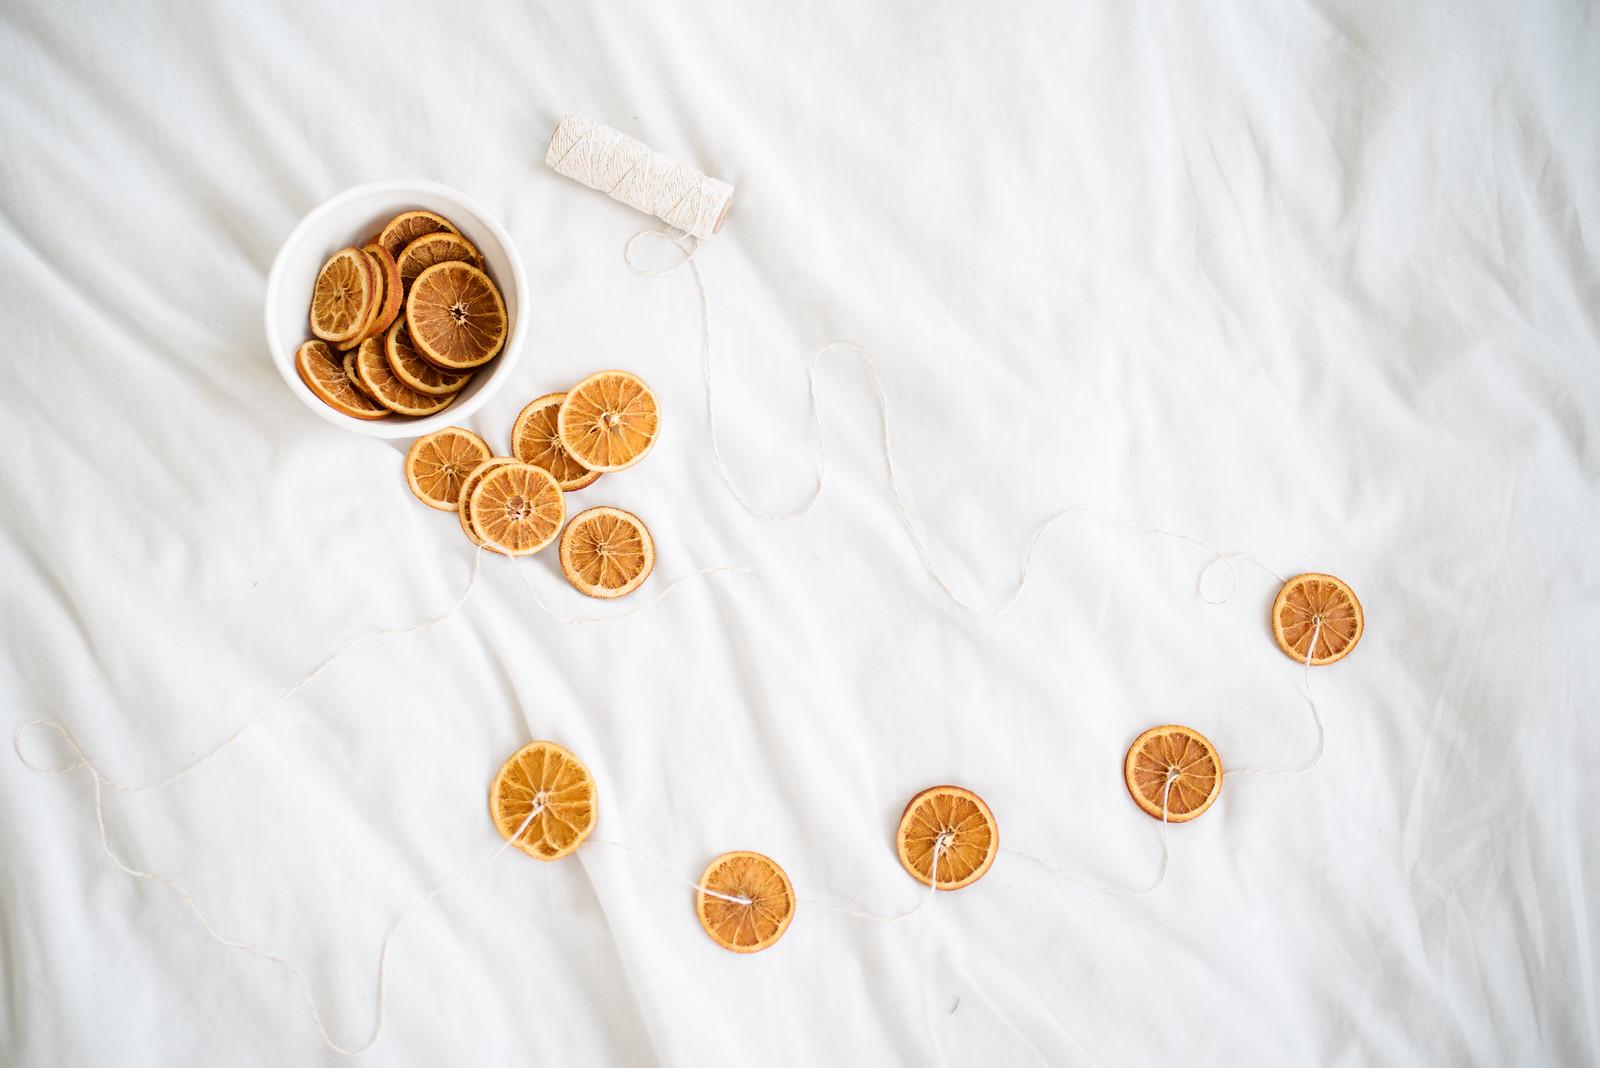 How To Dry Oranges on juliettelaura.blogspot.com